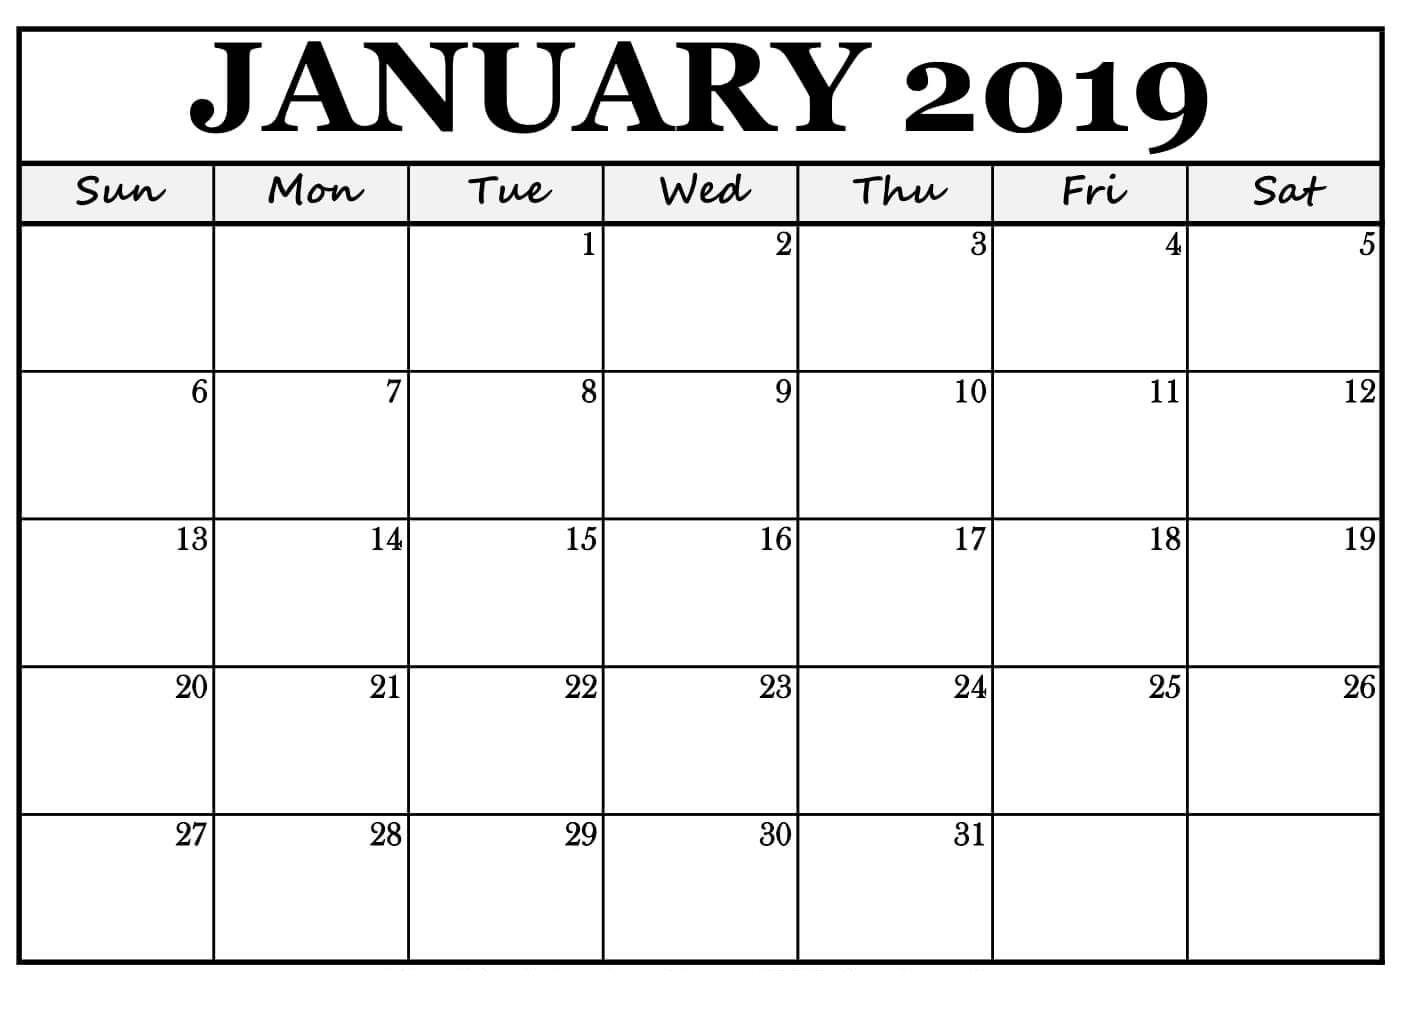 January 2019 Calendar For #Landscape Free Print | November Printable Calendar, Calendar